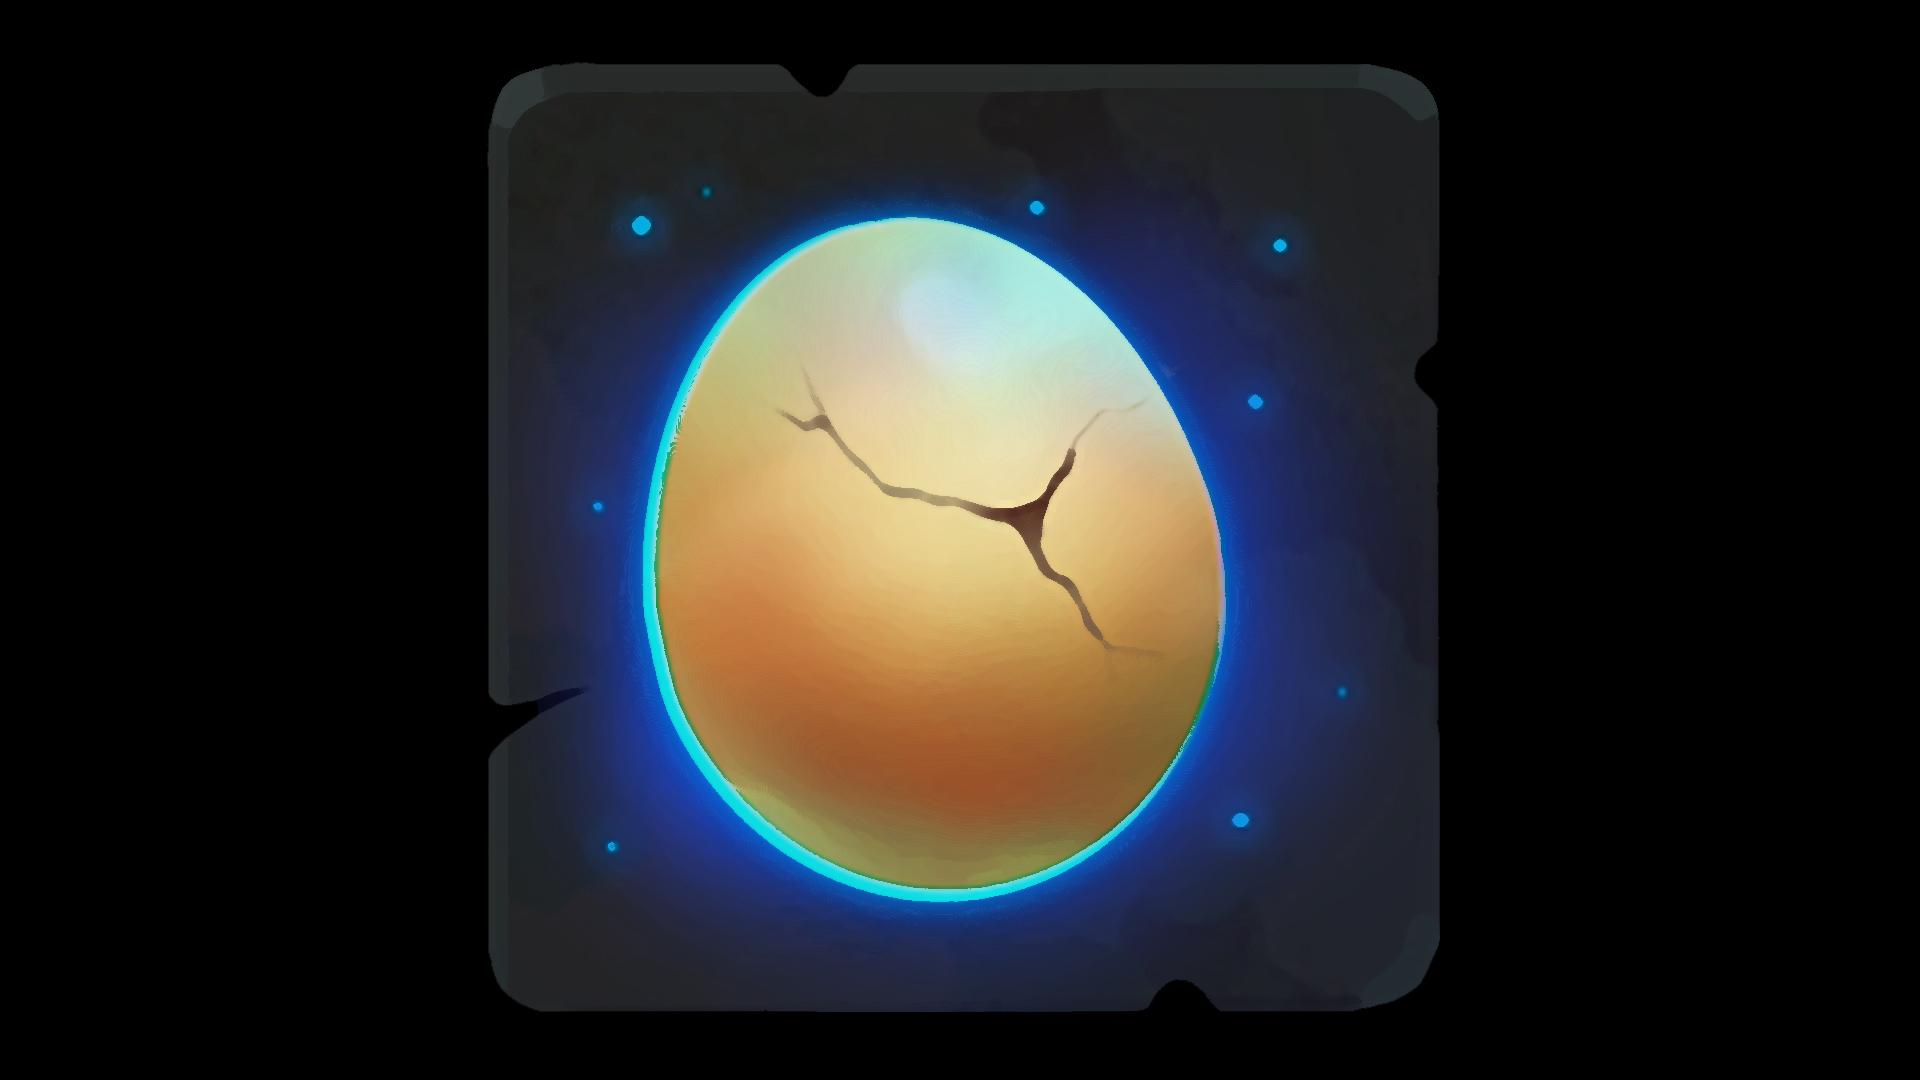 !egg achievement for Faeria on Xbox One